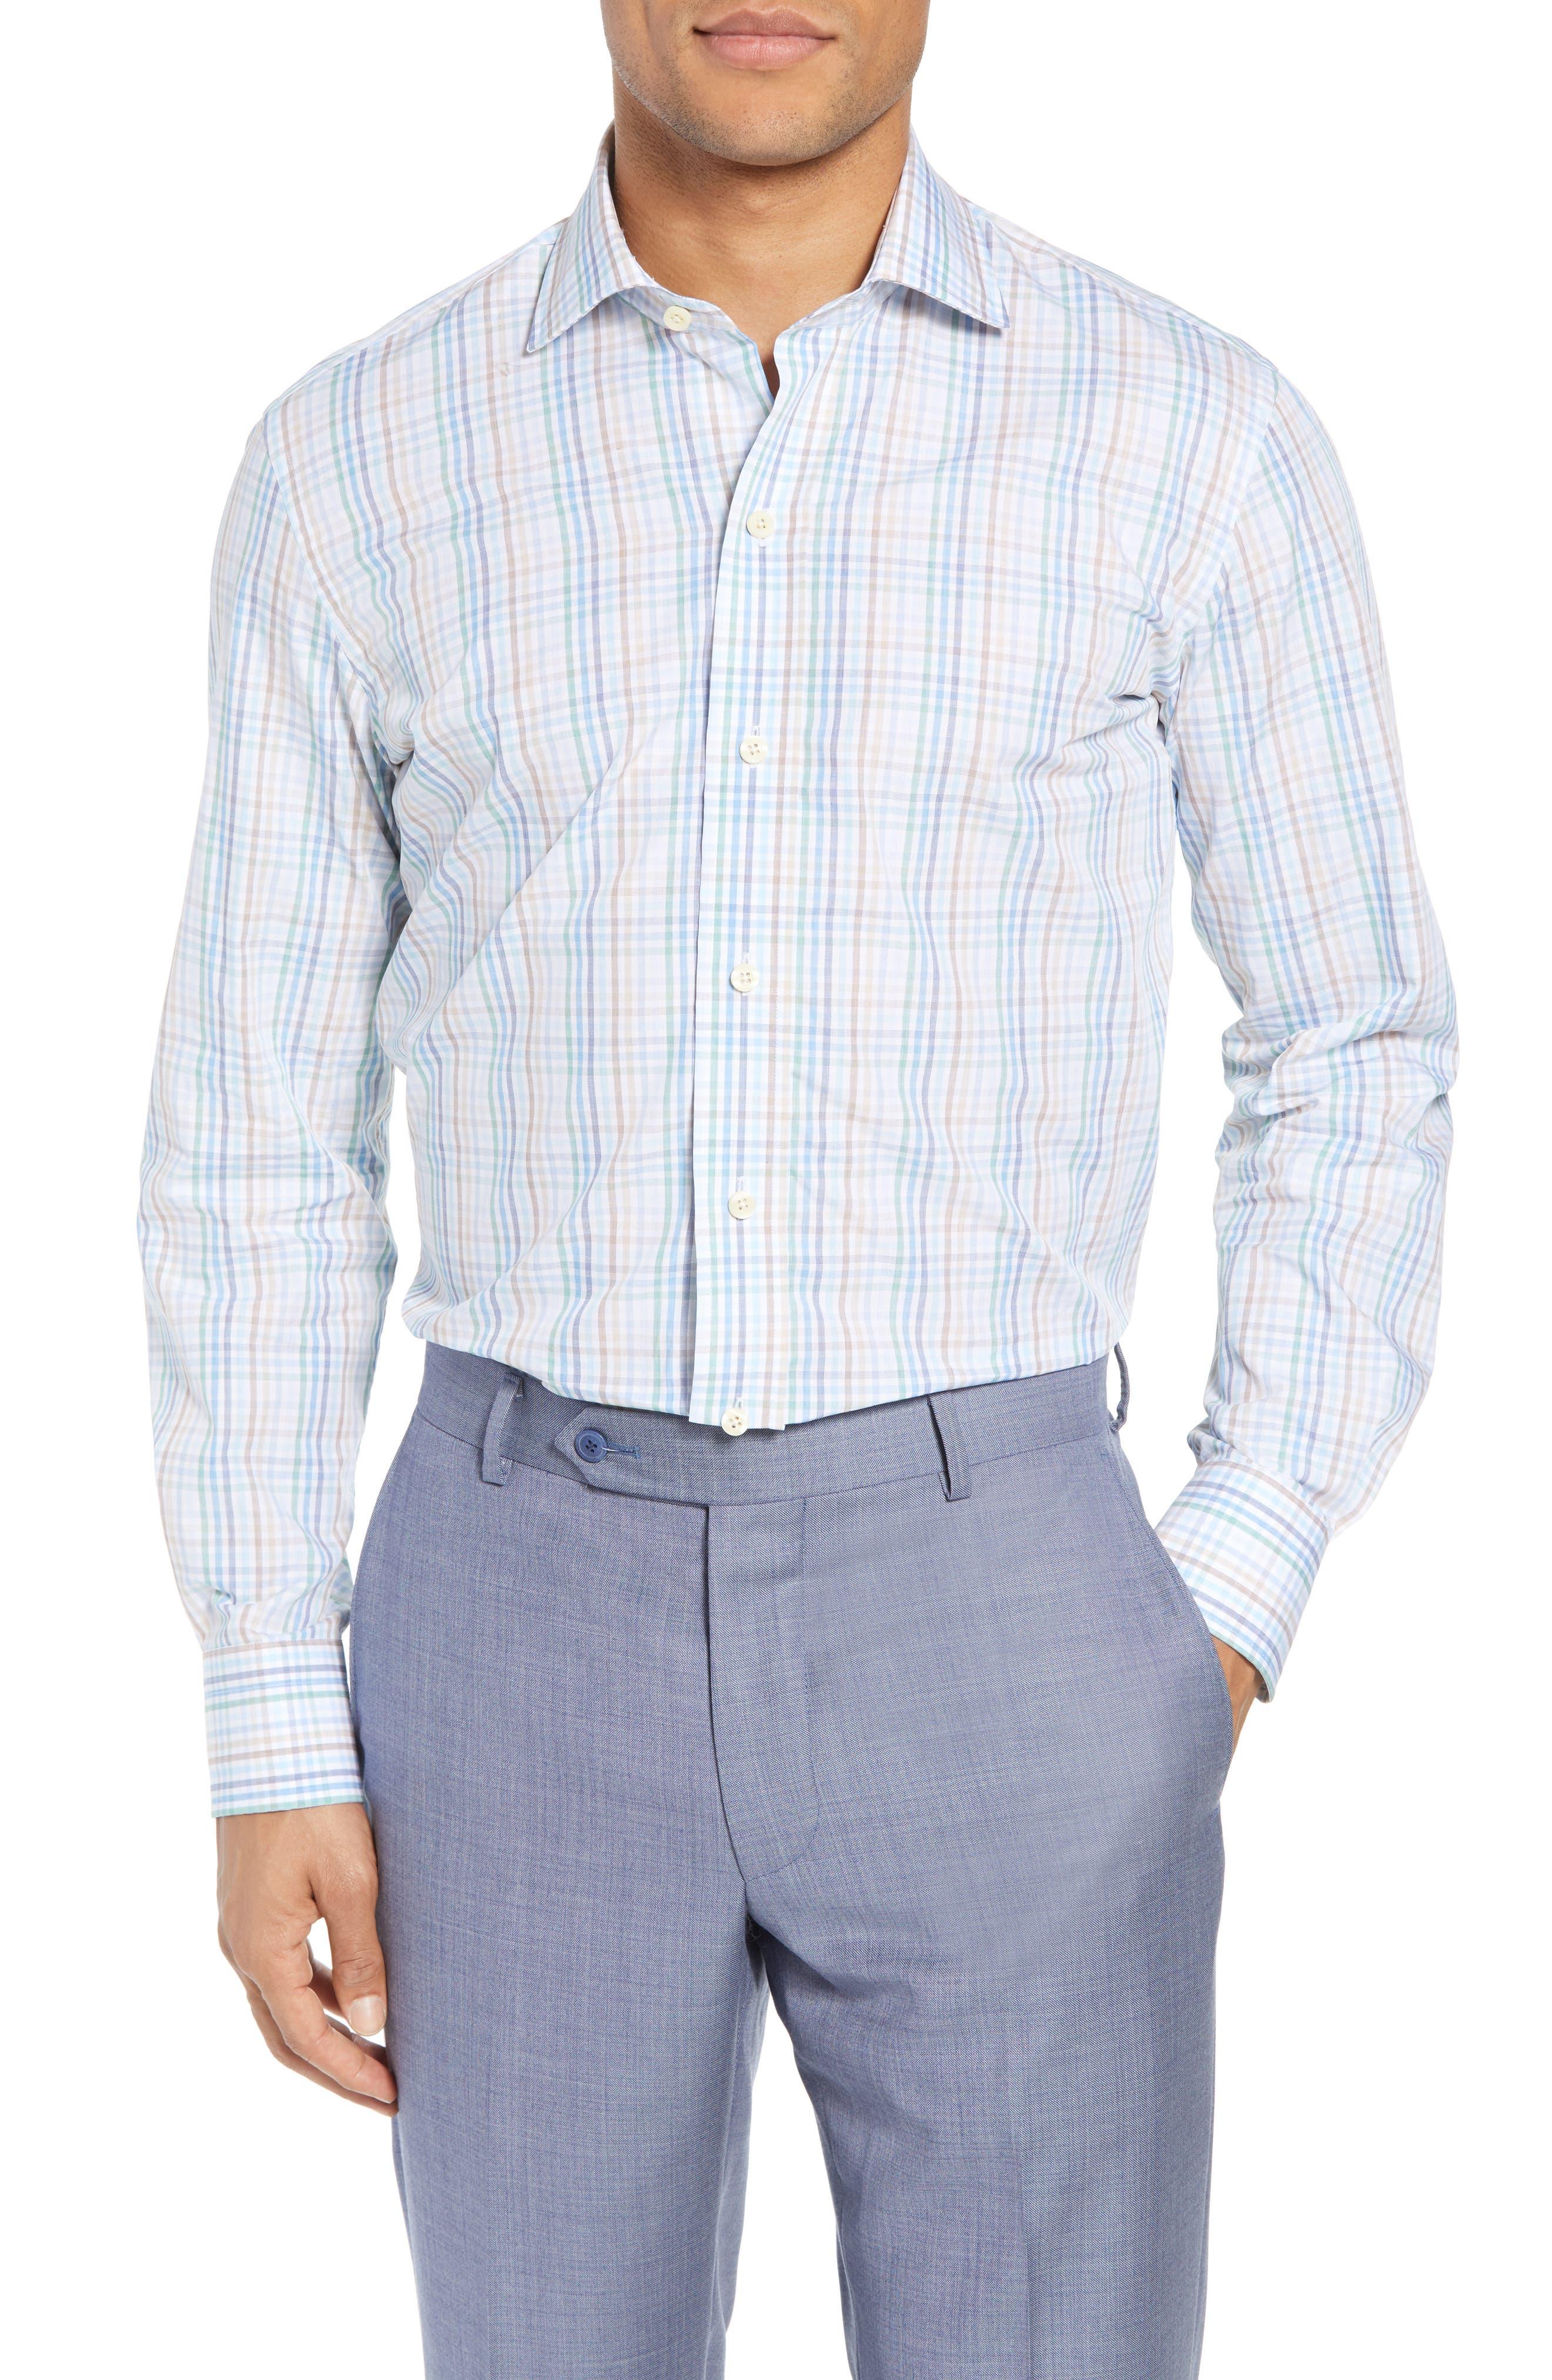 Albright Slim Fit Check Dress Shirt,                             Main thumbnail 1, color,                             308